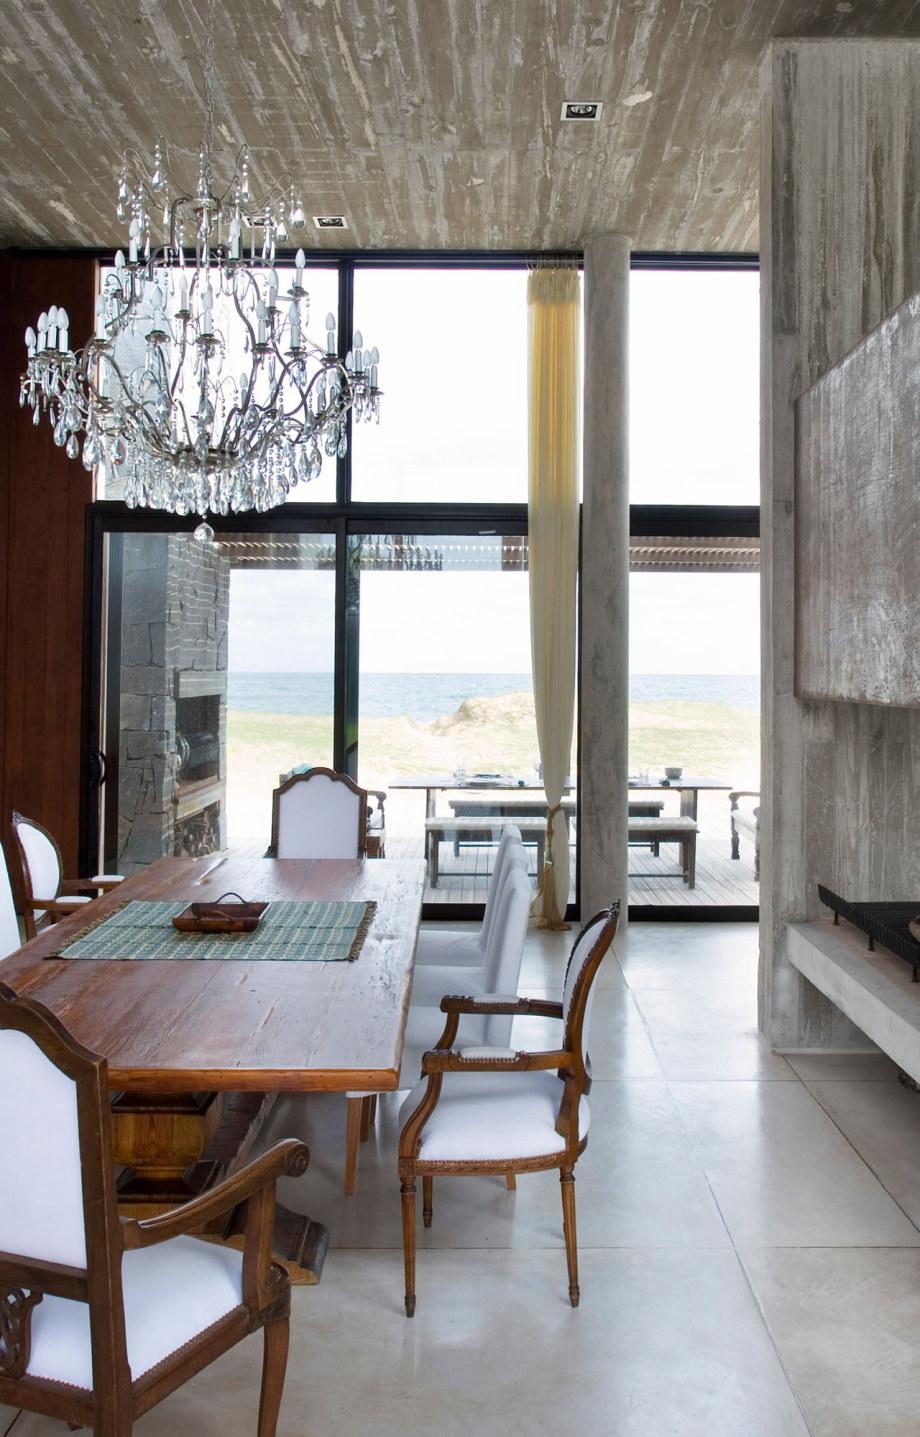 The beach house La Boyita Residence by Martin Gomez Arguitectos, Uruguay 28